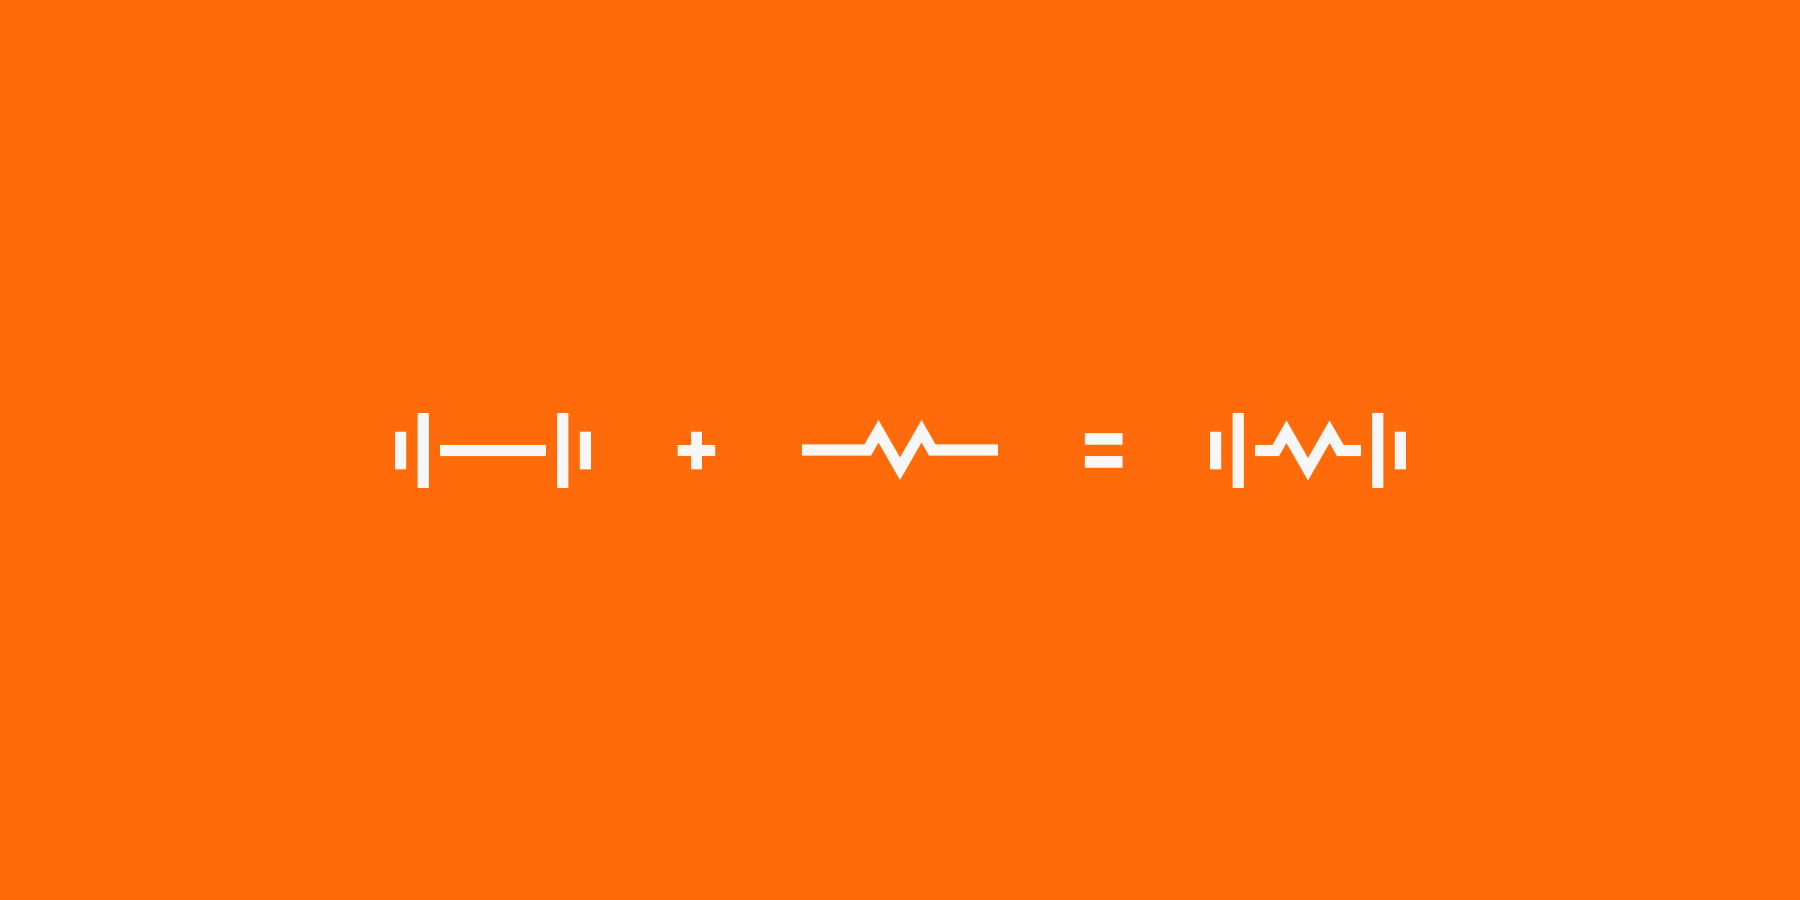 huba-method-logo-design-03